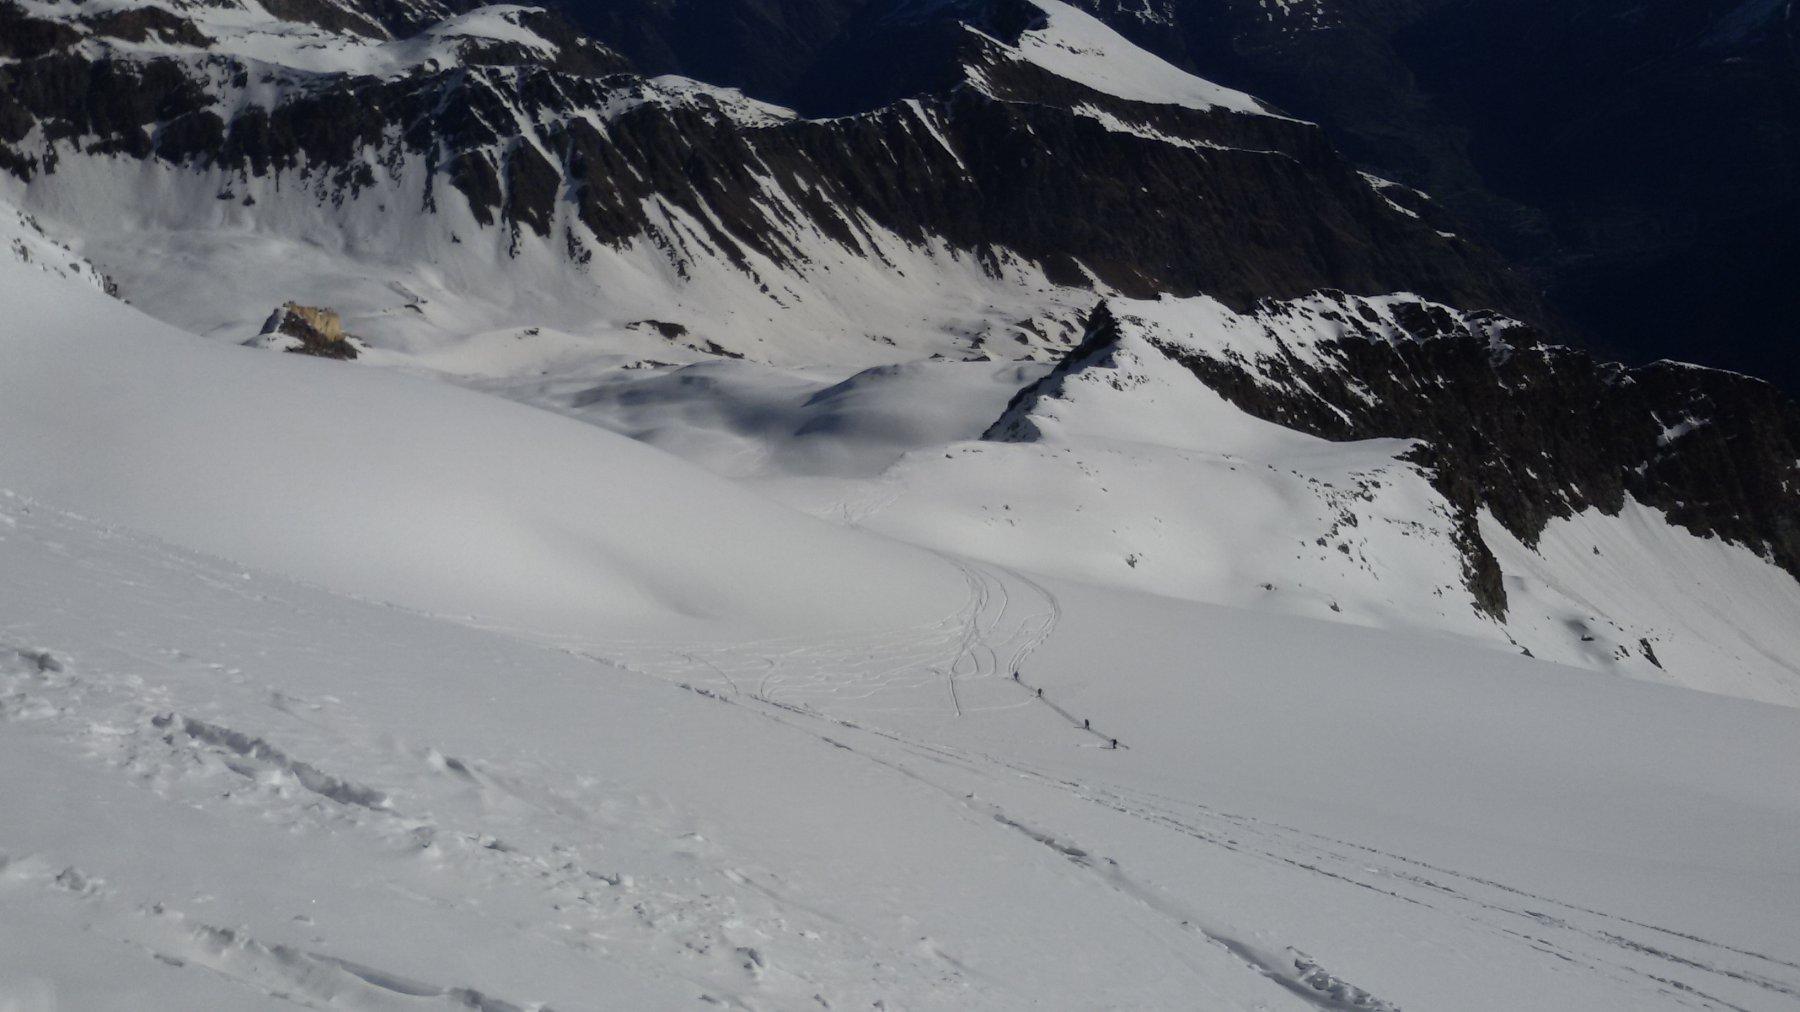 Cordata in salita sul ghiacciaio